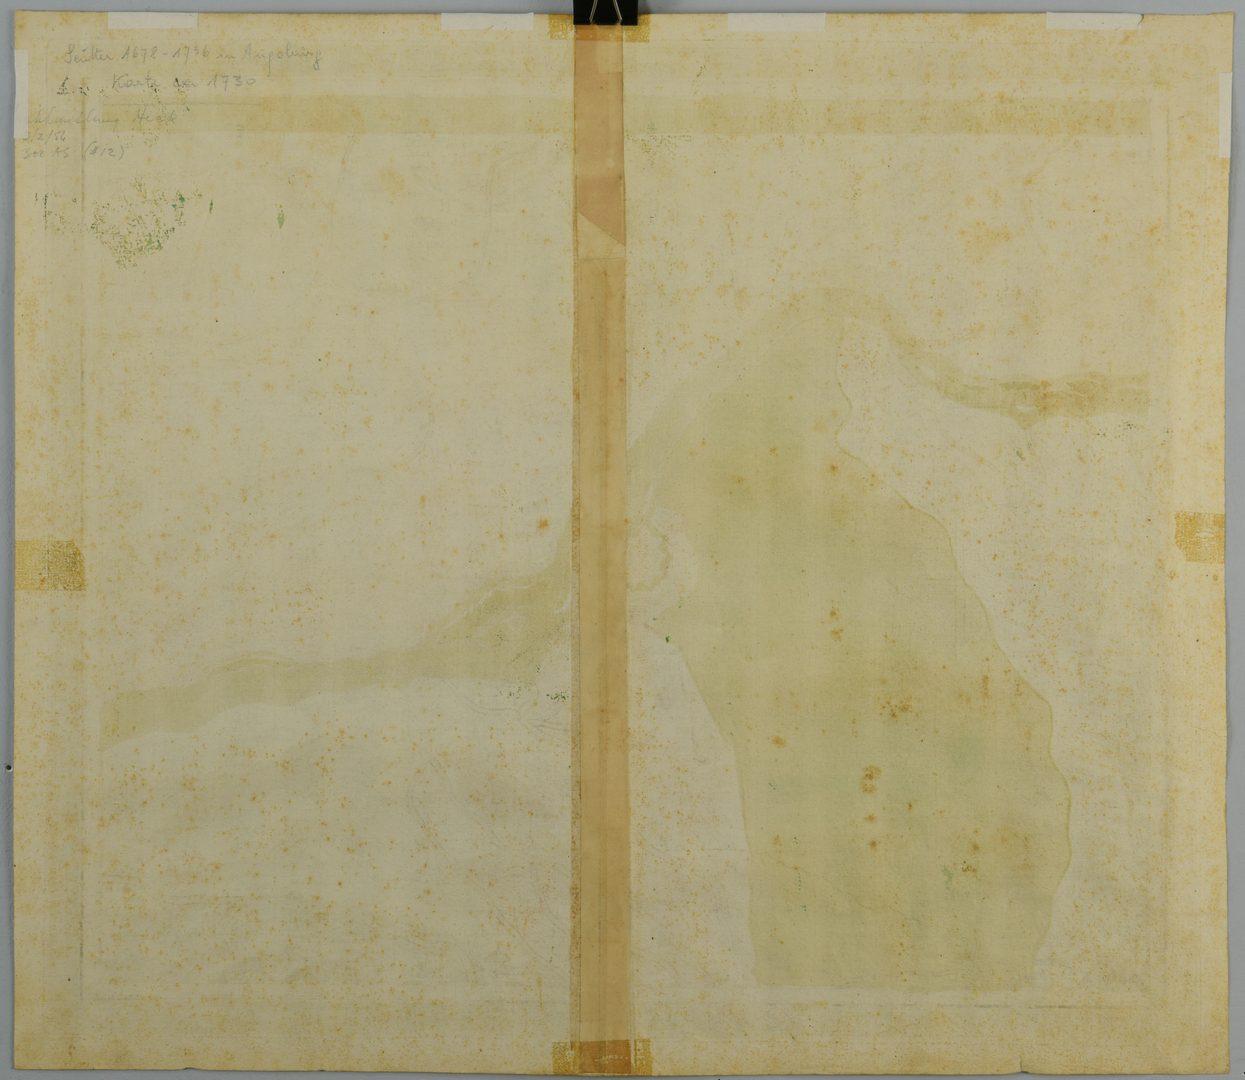 Lot 109: Tobias Conrad Lotter Map of Germany, Vienna, 1760